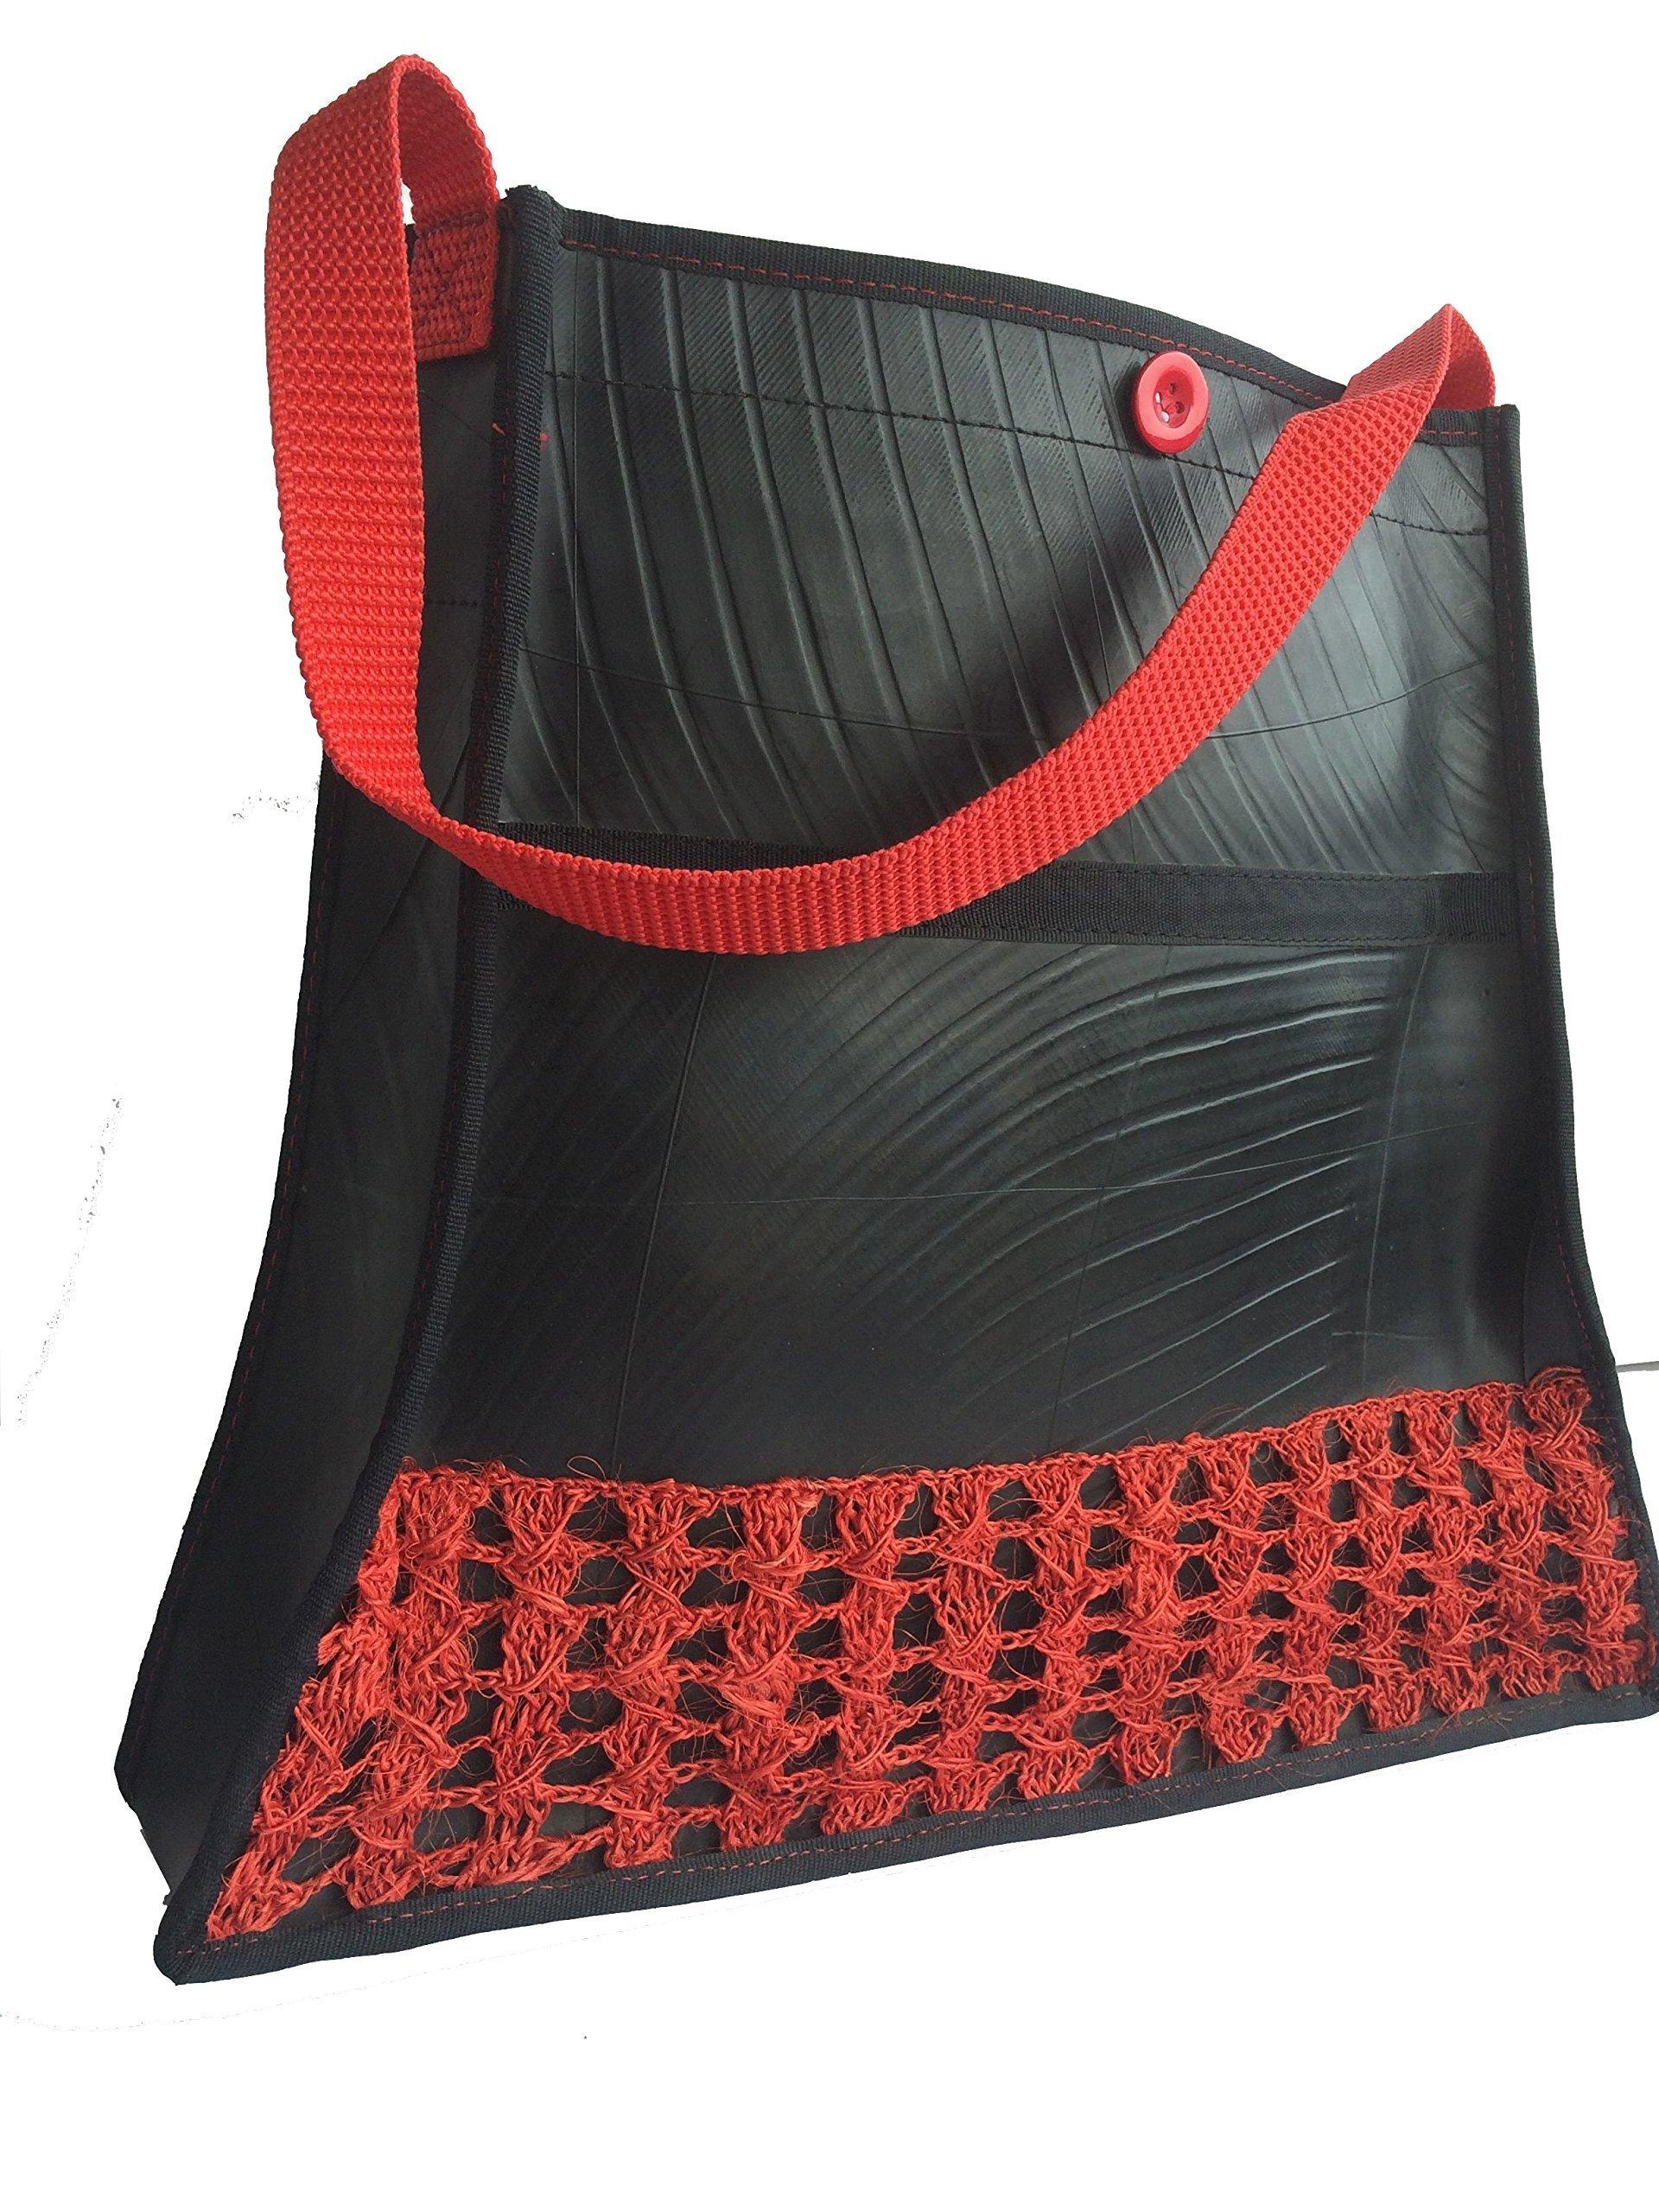 Recycled Rubber Tote handbag Iraka Crochet - handmade-bags